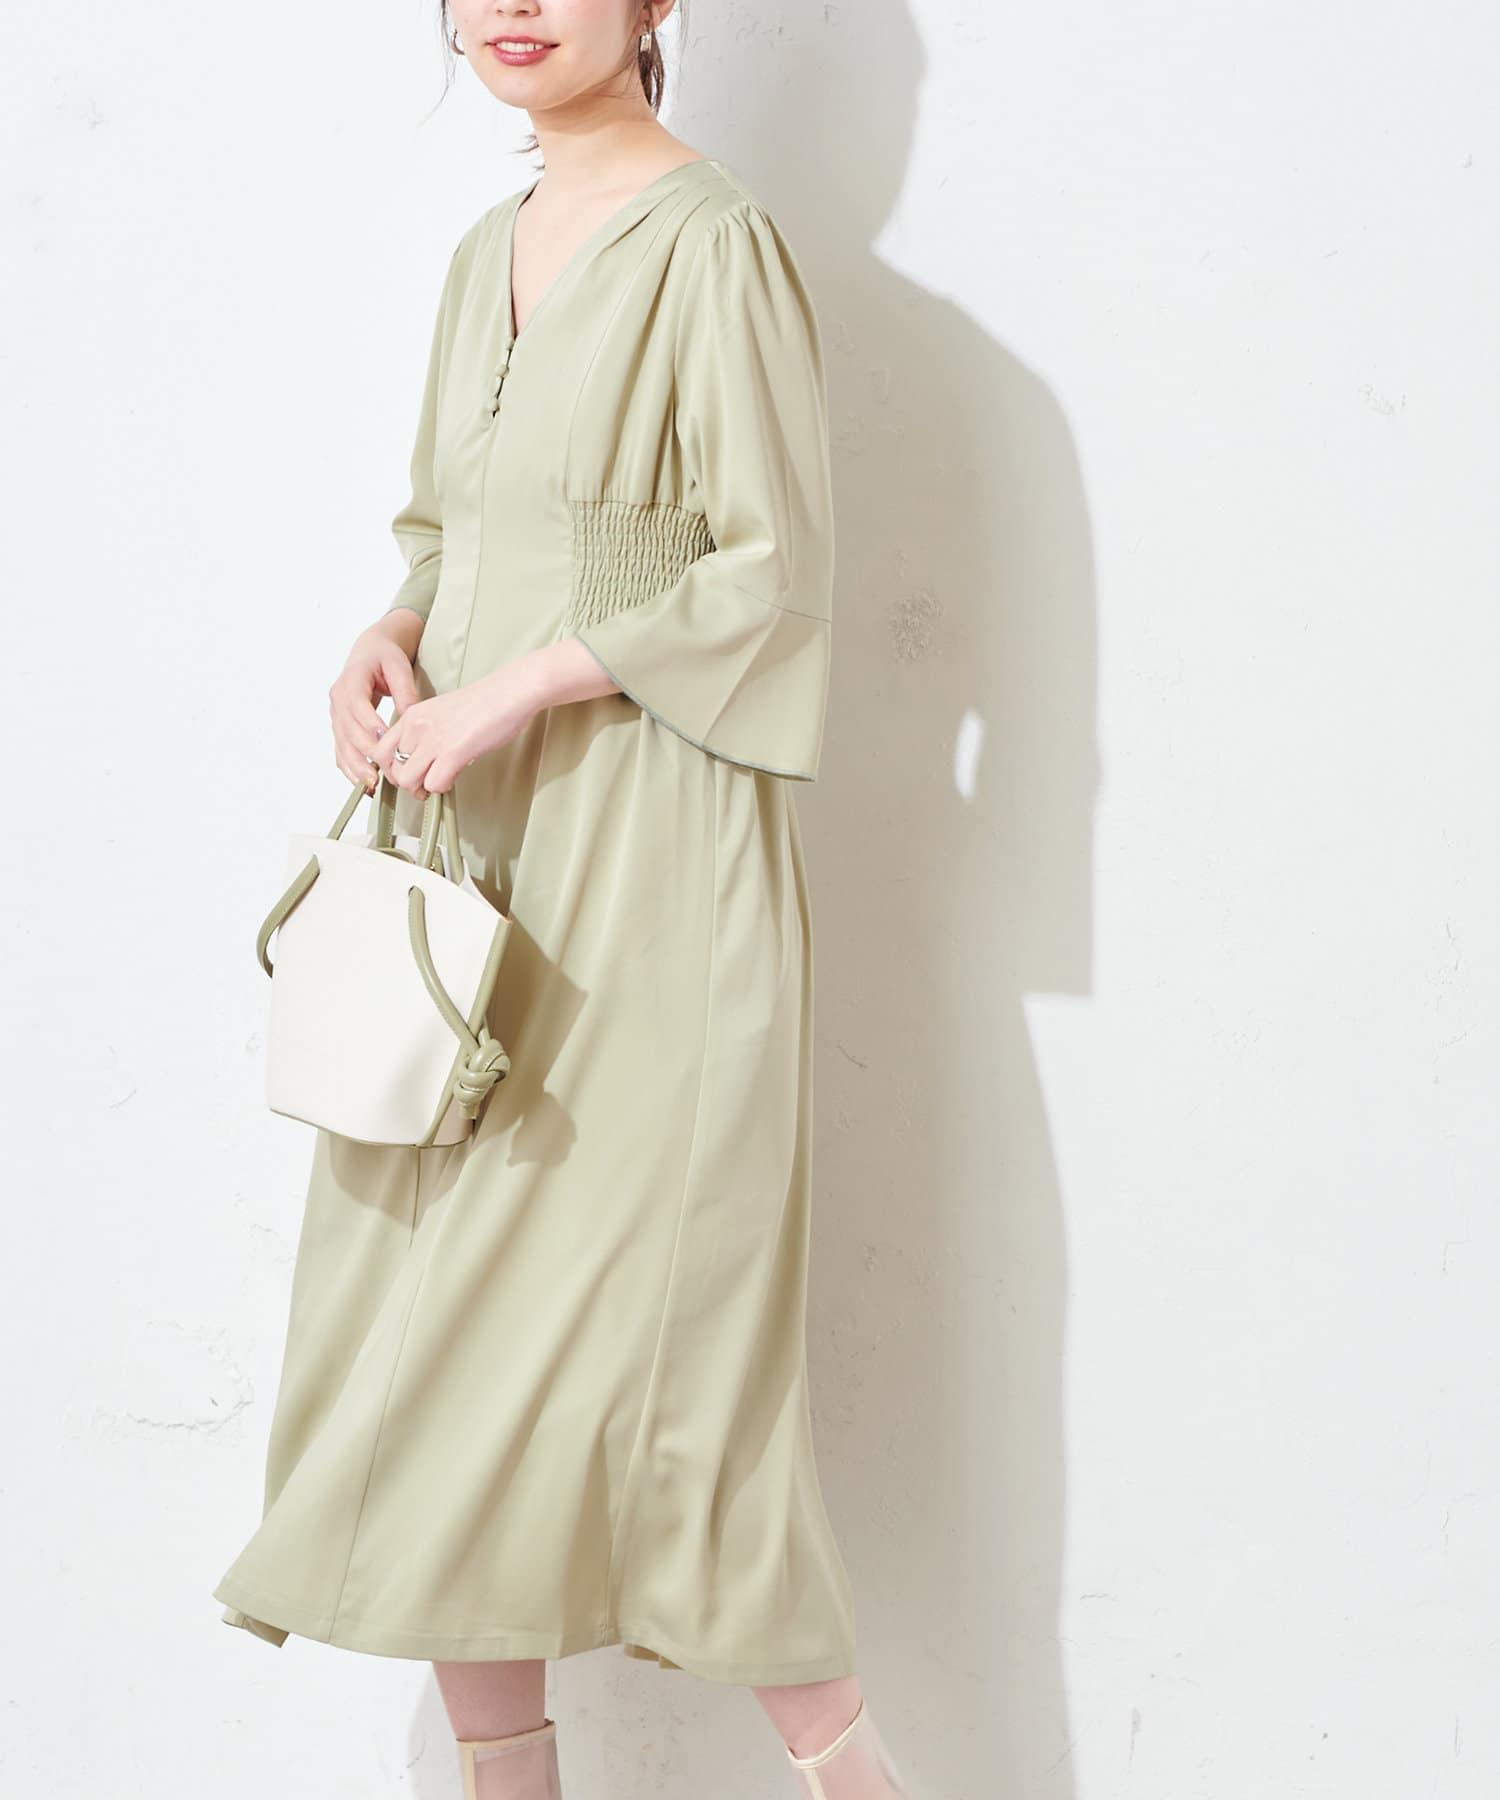 natural couture(ナチュラルクチュール) 【WEB限定カラー有り】レトロ小花配色ワンピース